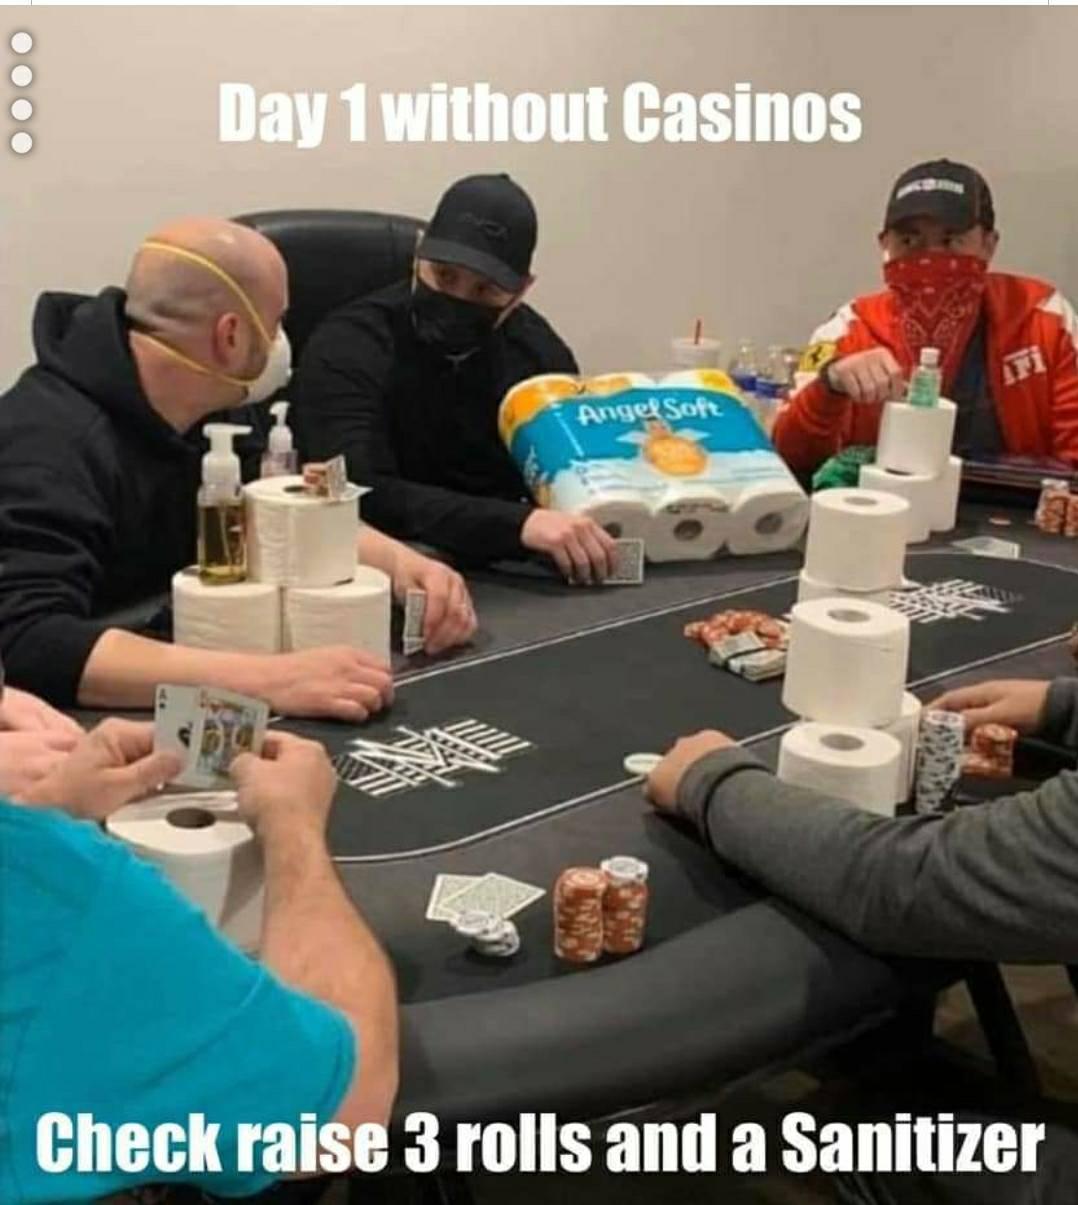 Covid poker image